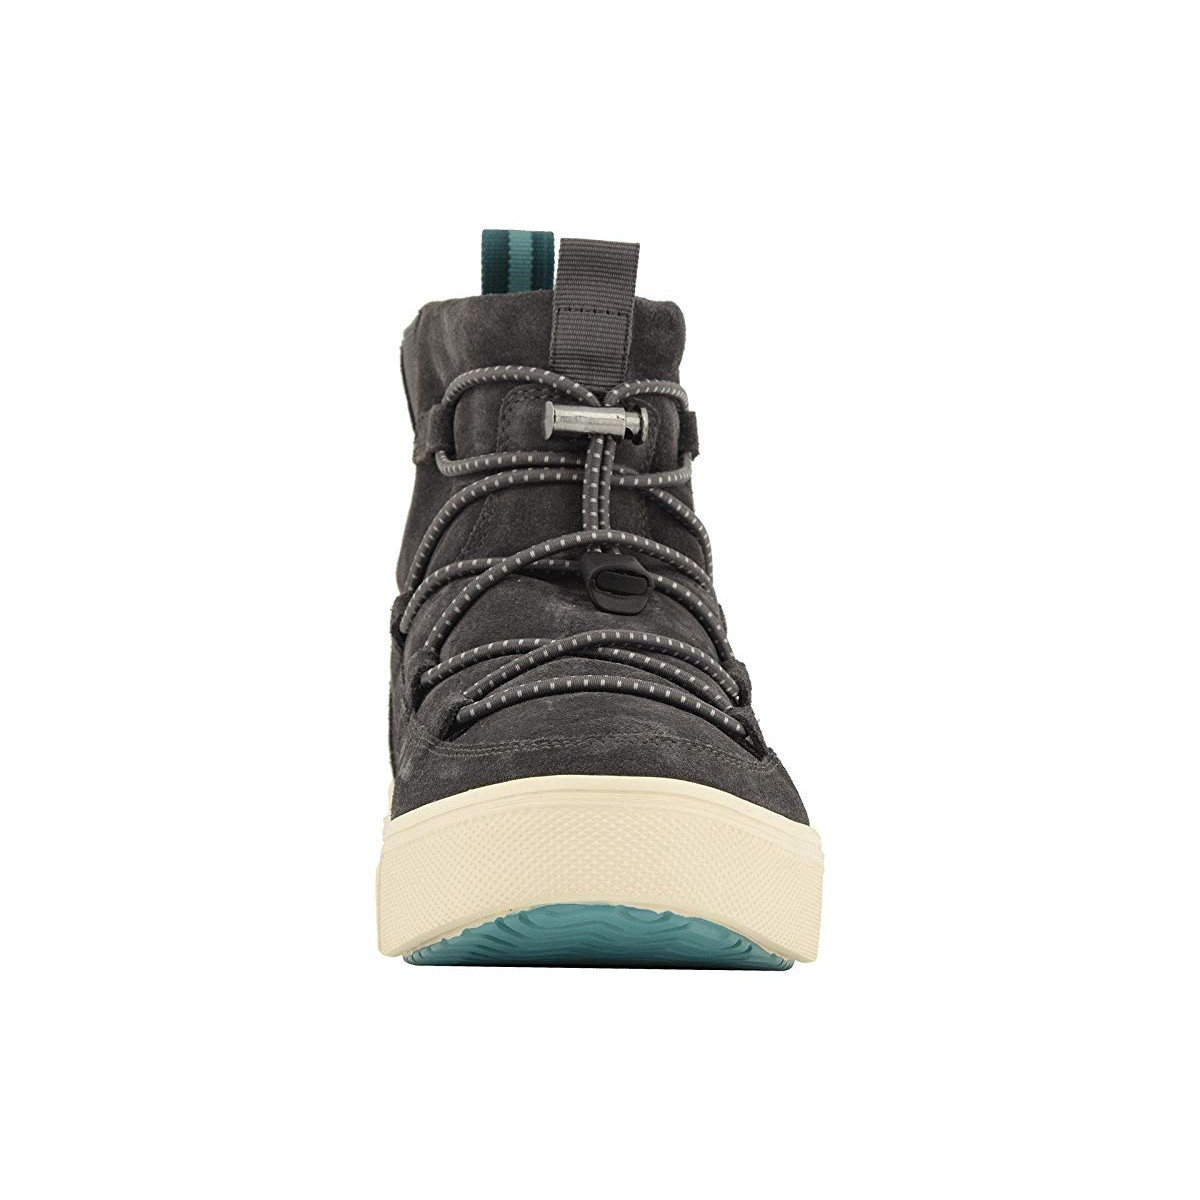 TOMS Trvl Lite Alpine boots grey